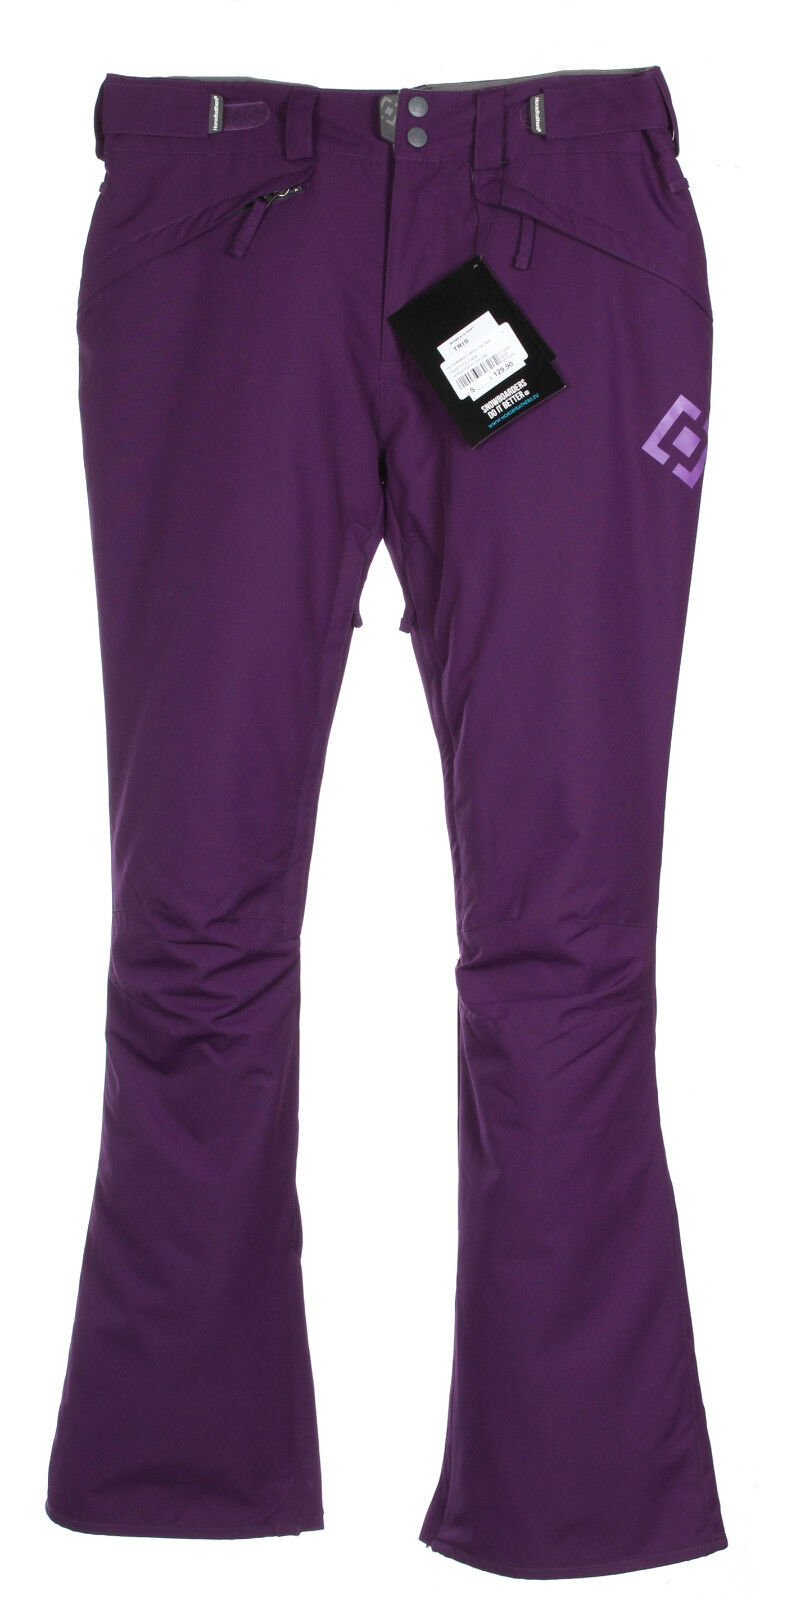 Horsefeathers Tris Ski- & Snowboardhose    Purple    Gr. S    UVP 129,90